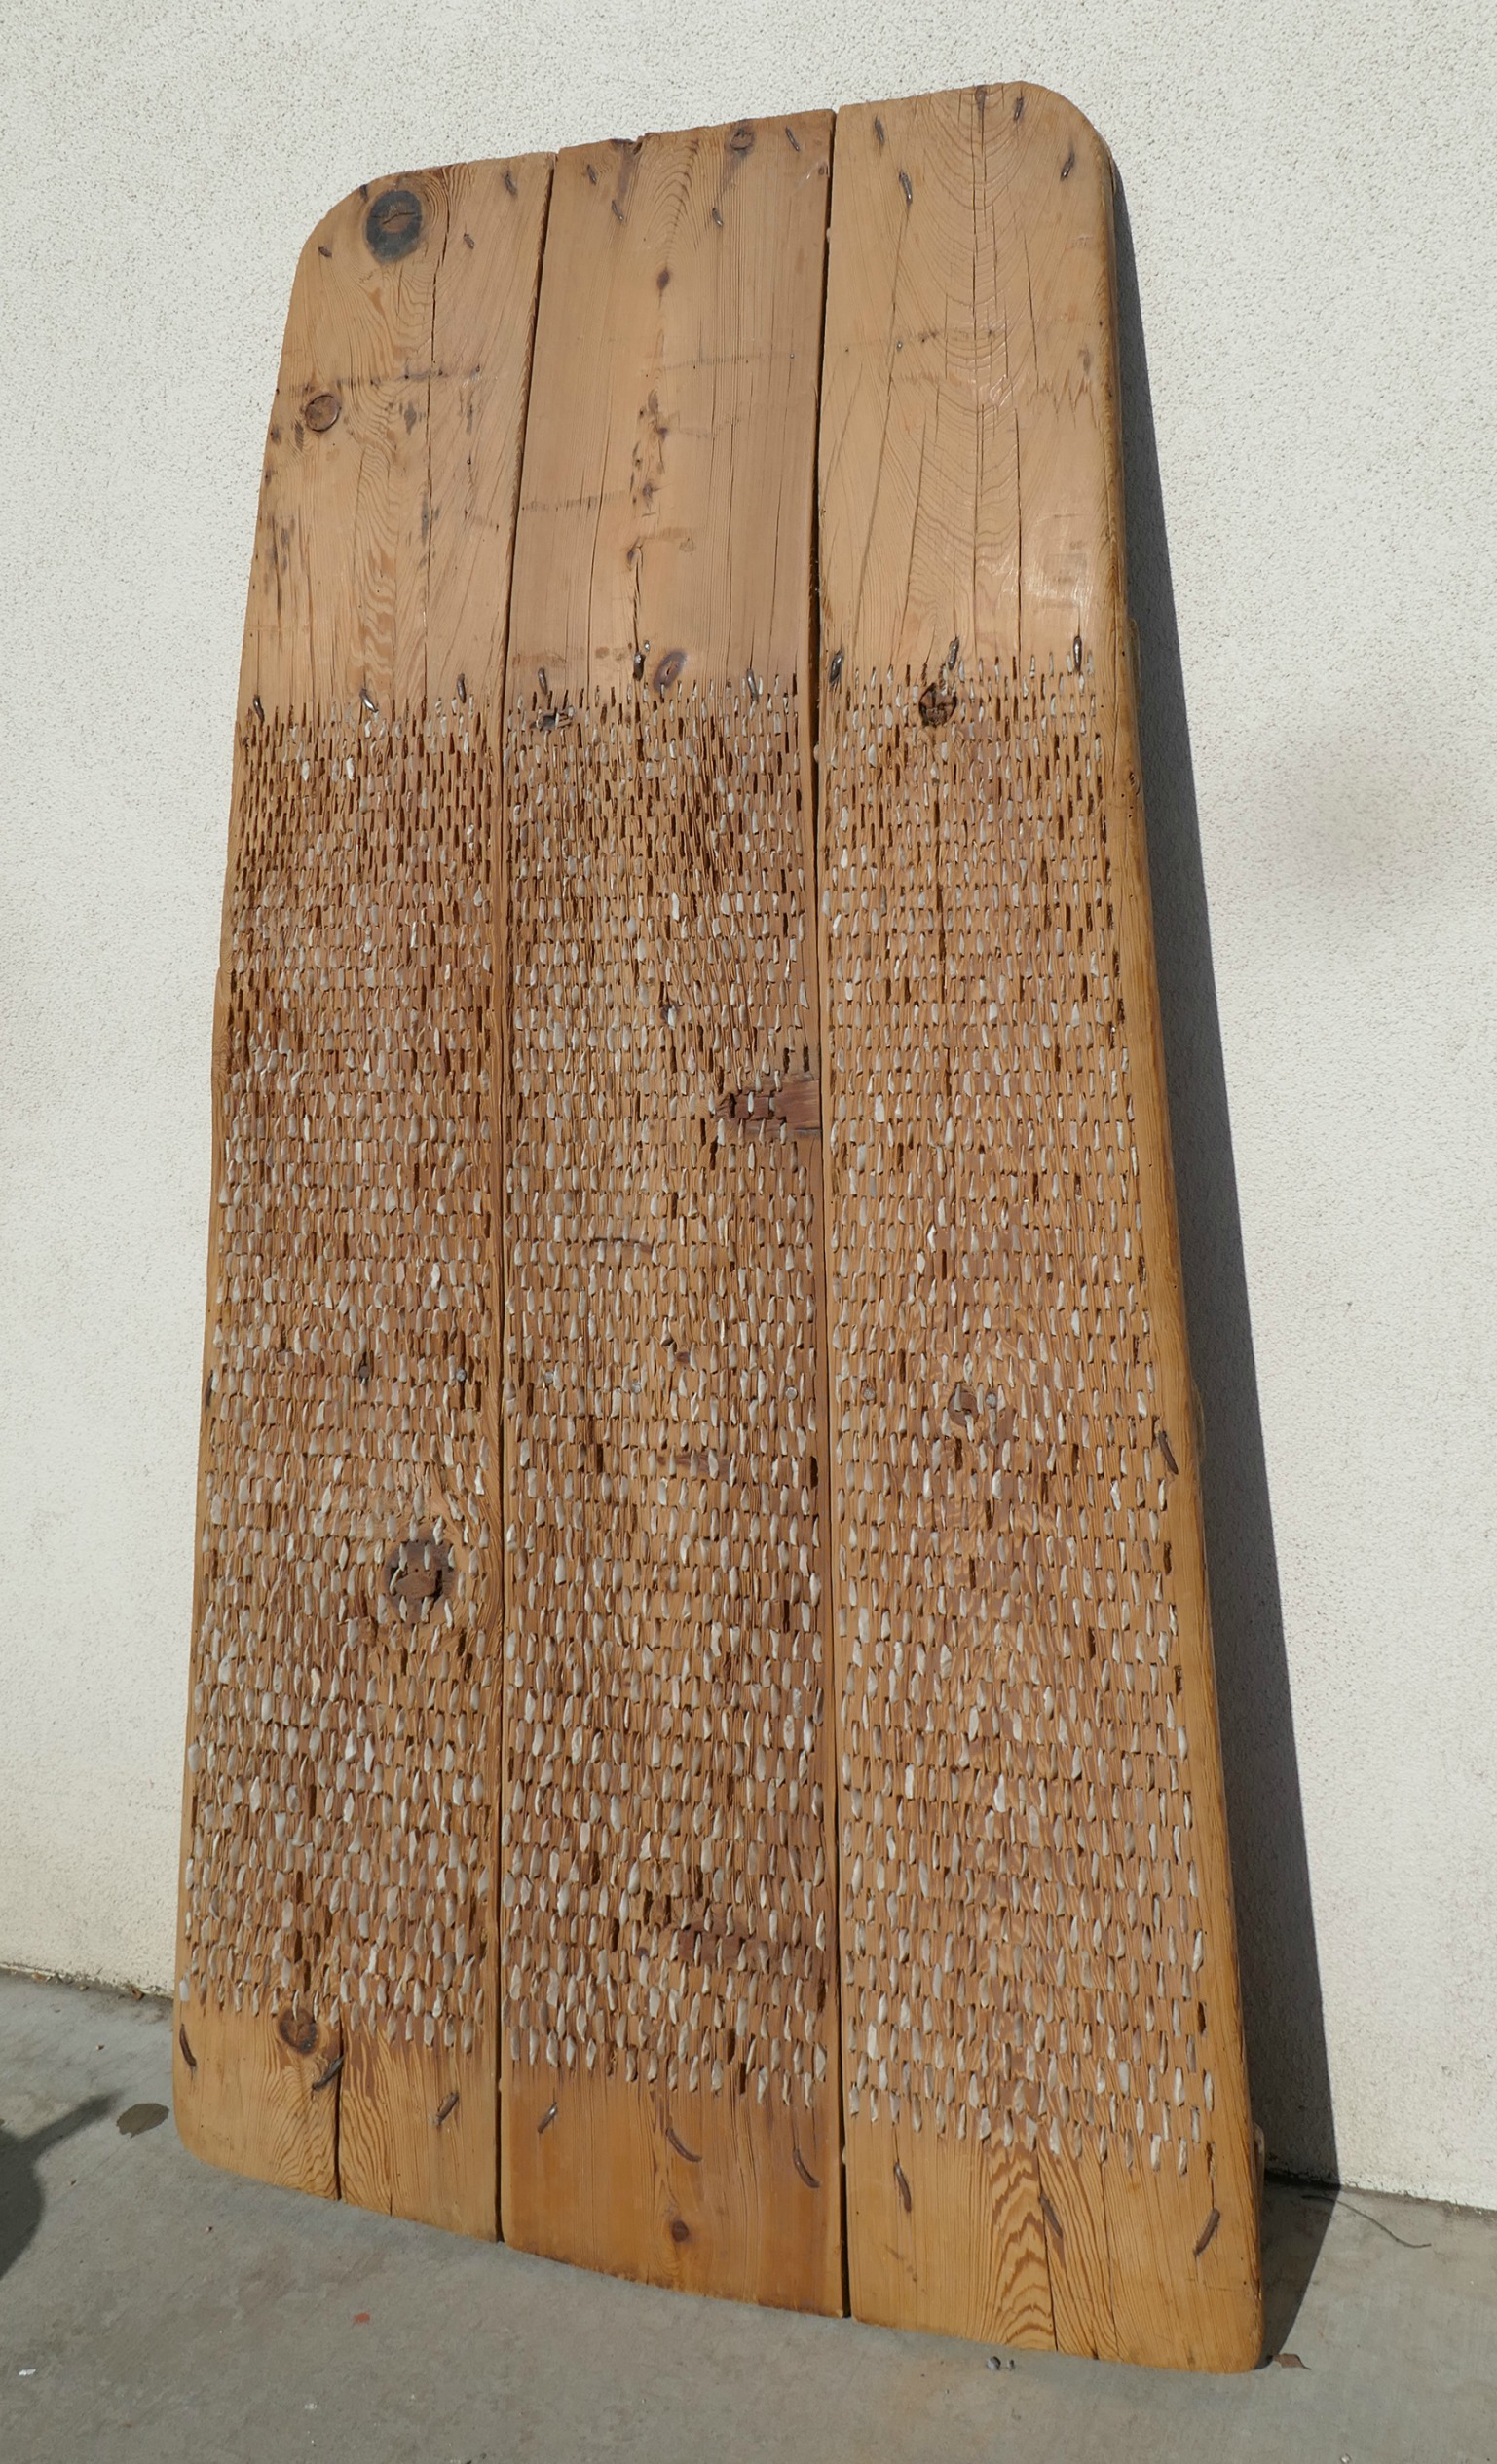 antique-french-threshing-board-8683